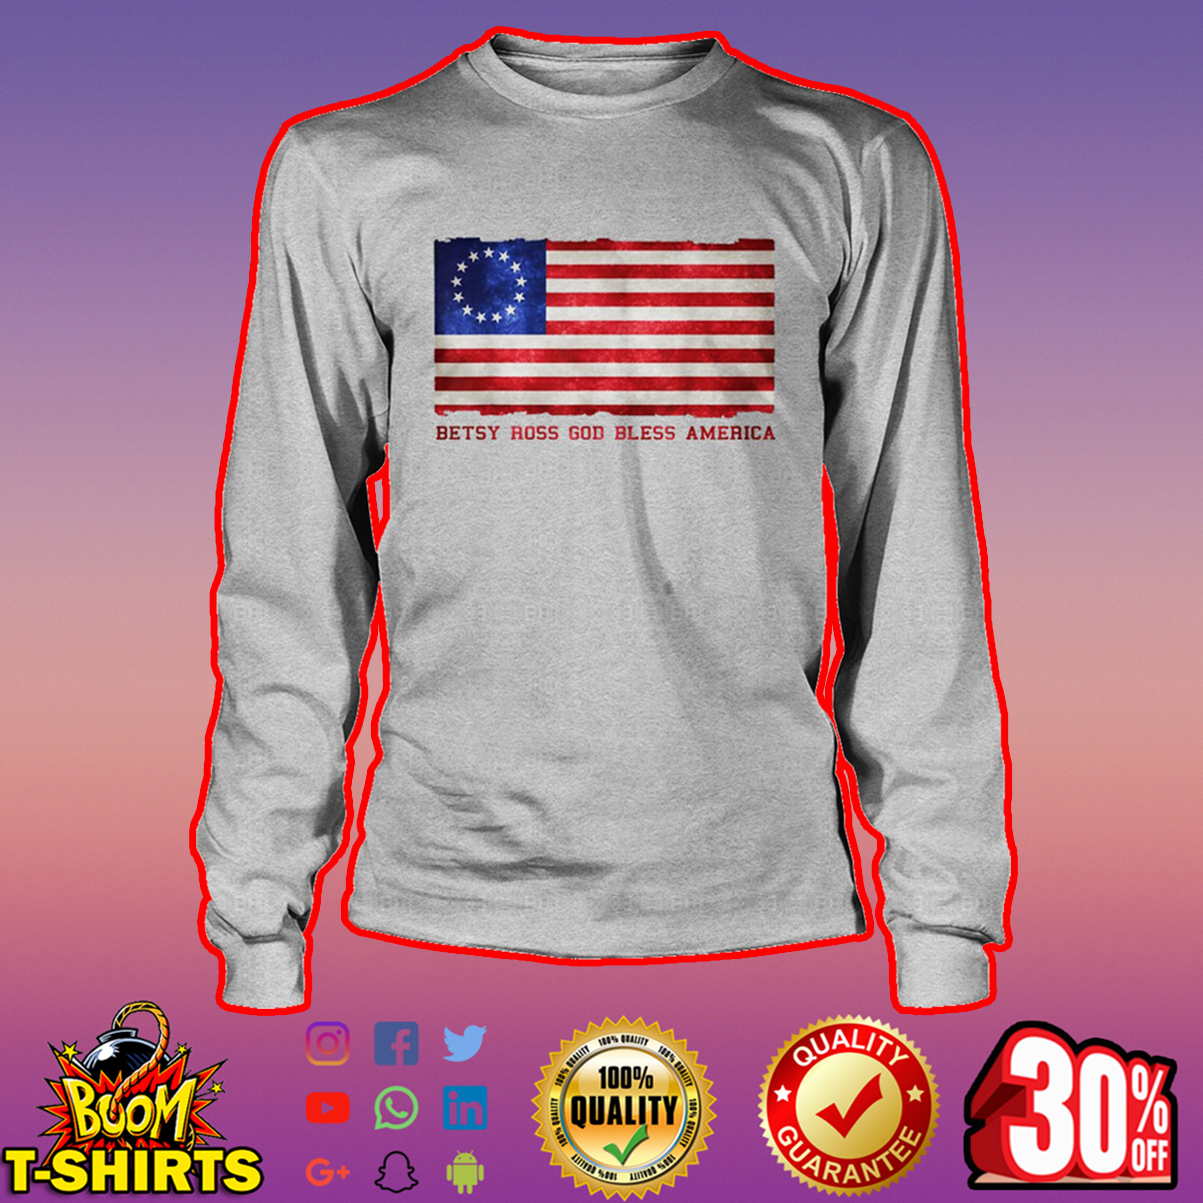 Betsy Ross God bless America long sleeve tee